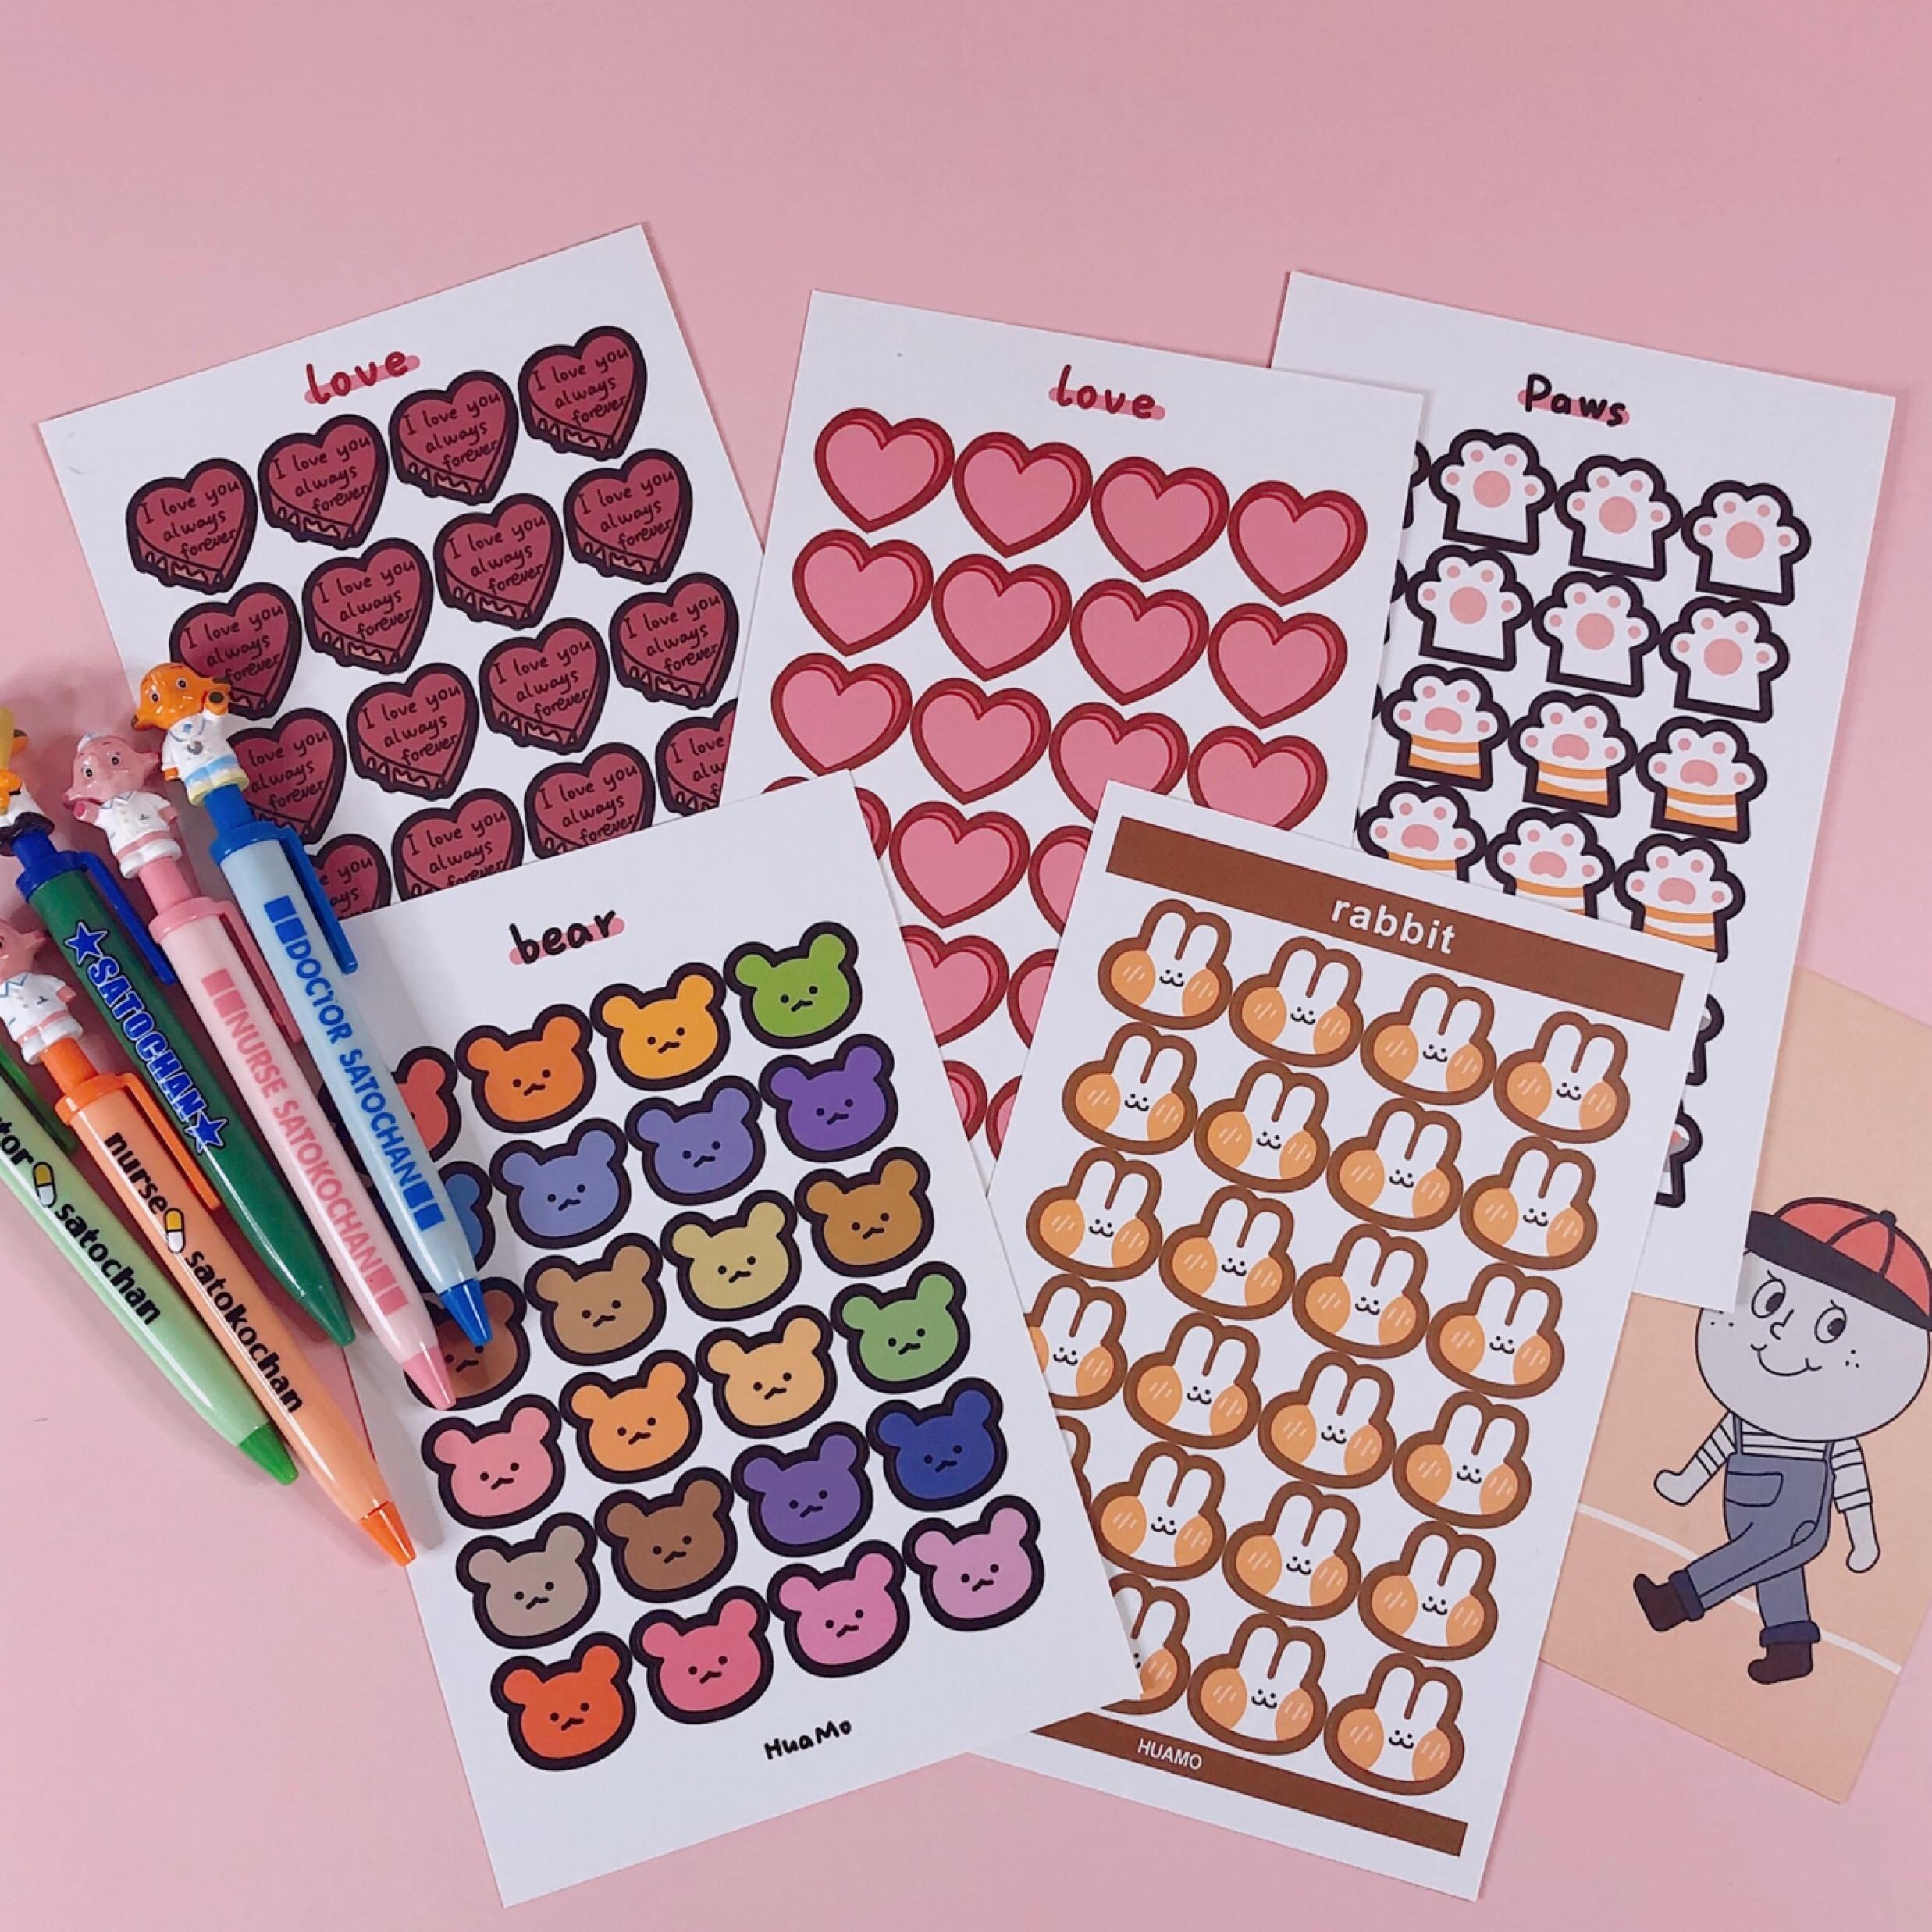 24pcs/page Cartoon Little Stickers DIY Scrapbooking Week Phone Album Diary Happy Planner Journal Decoration Sticker